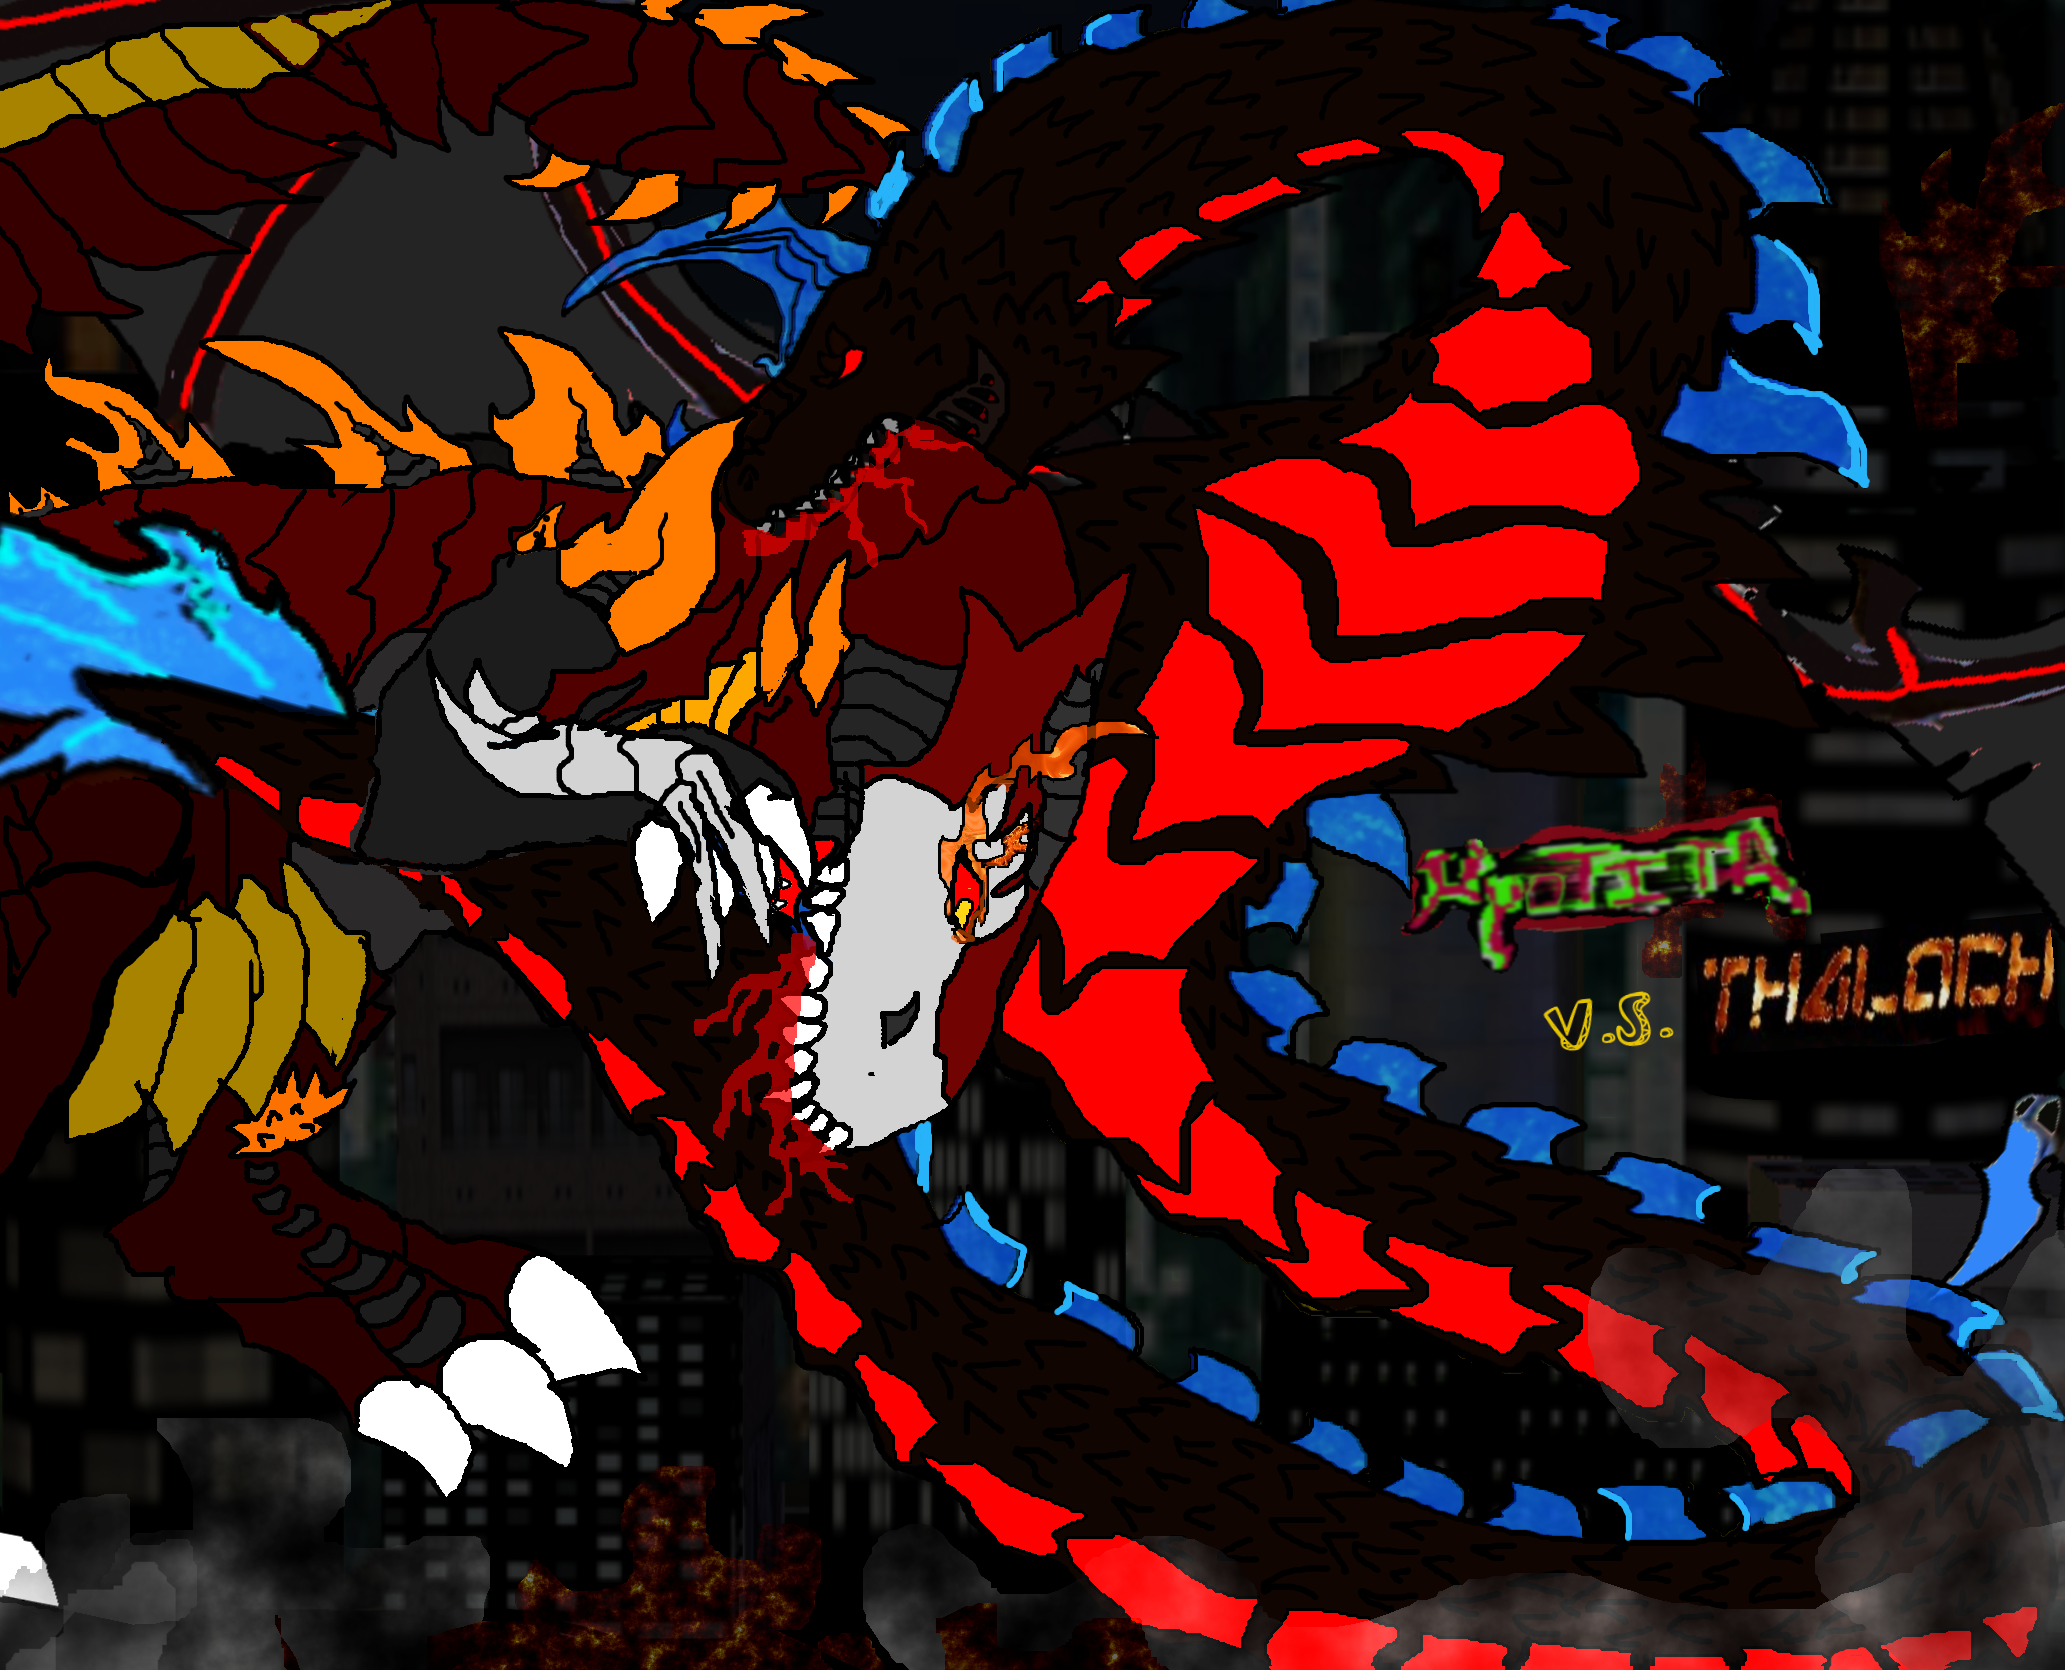 Kyotita vs Thaloch by Kyotita